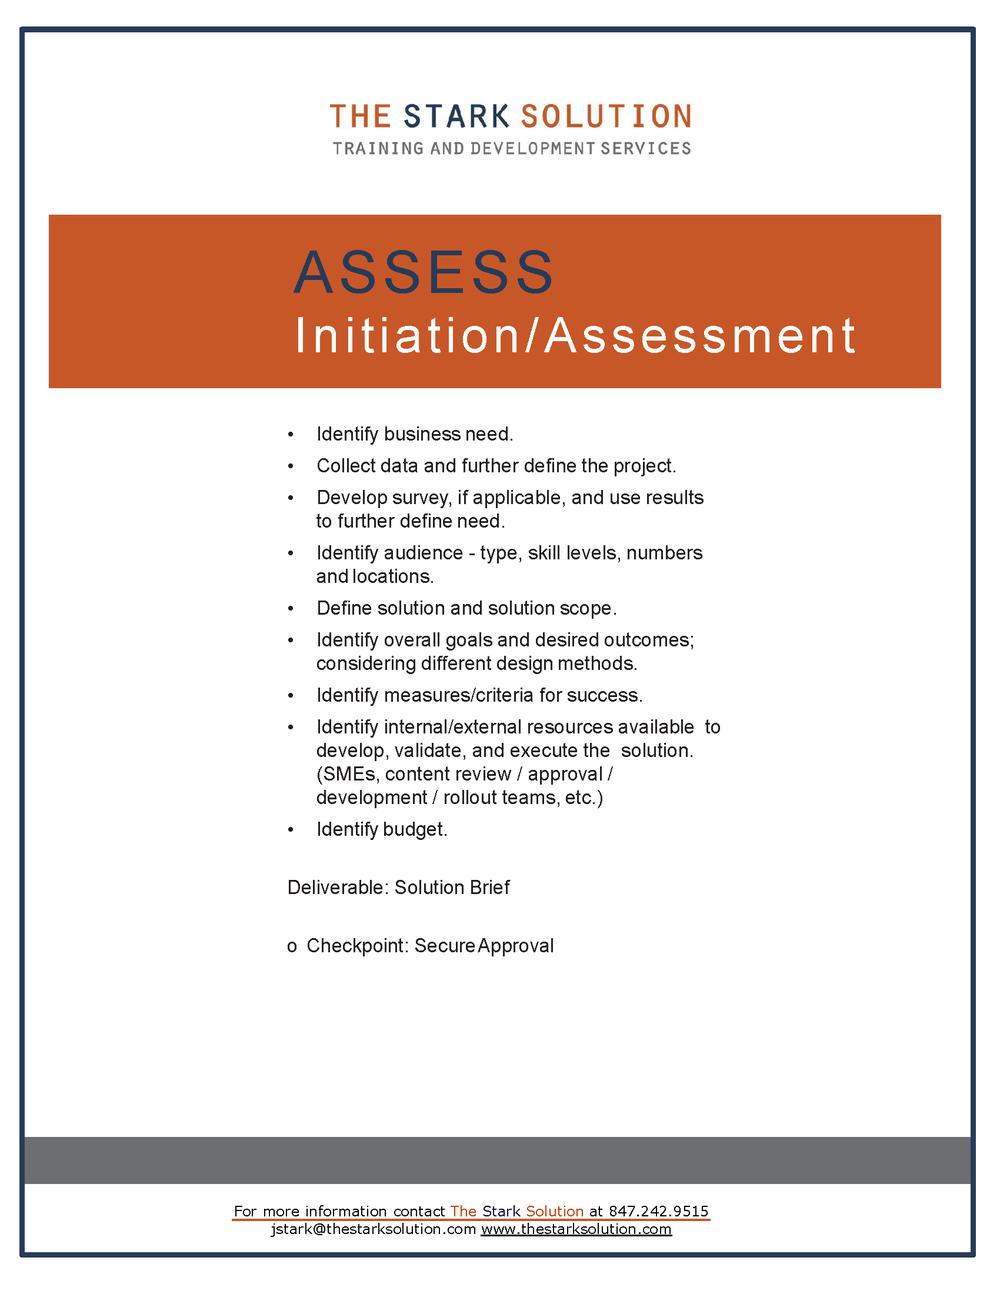 assess_2017.png